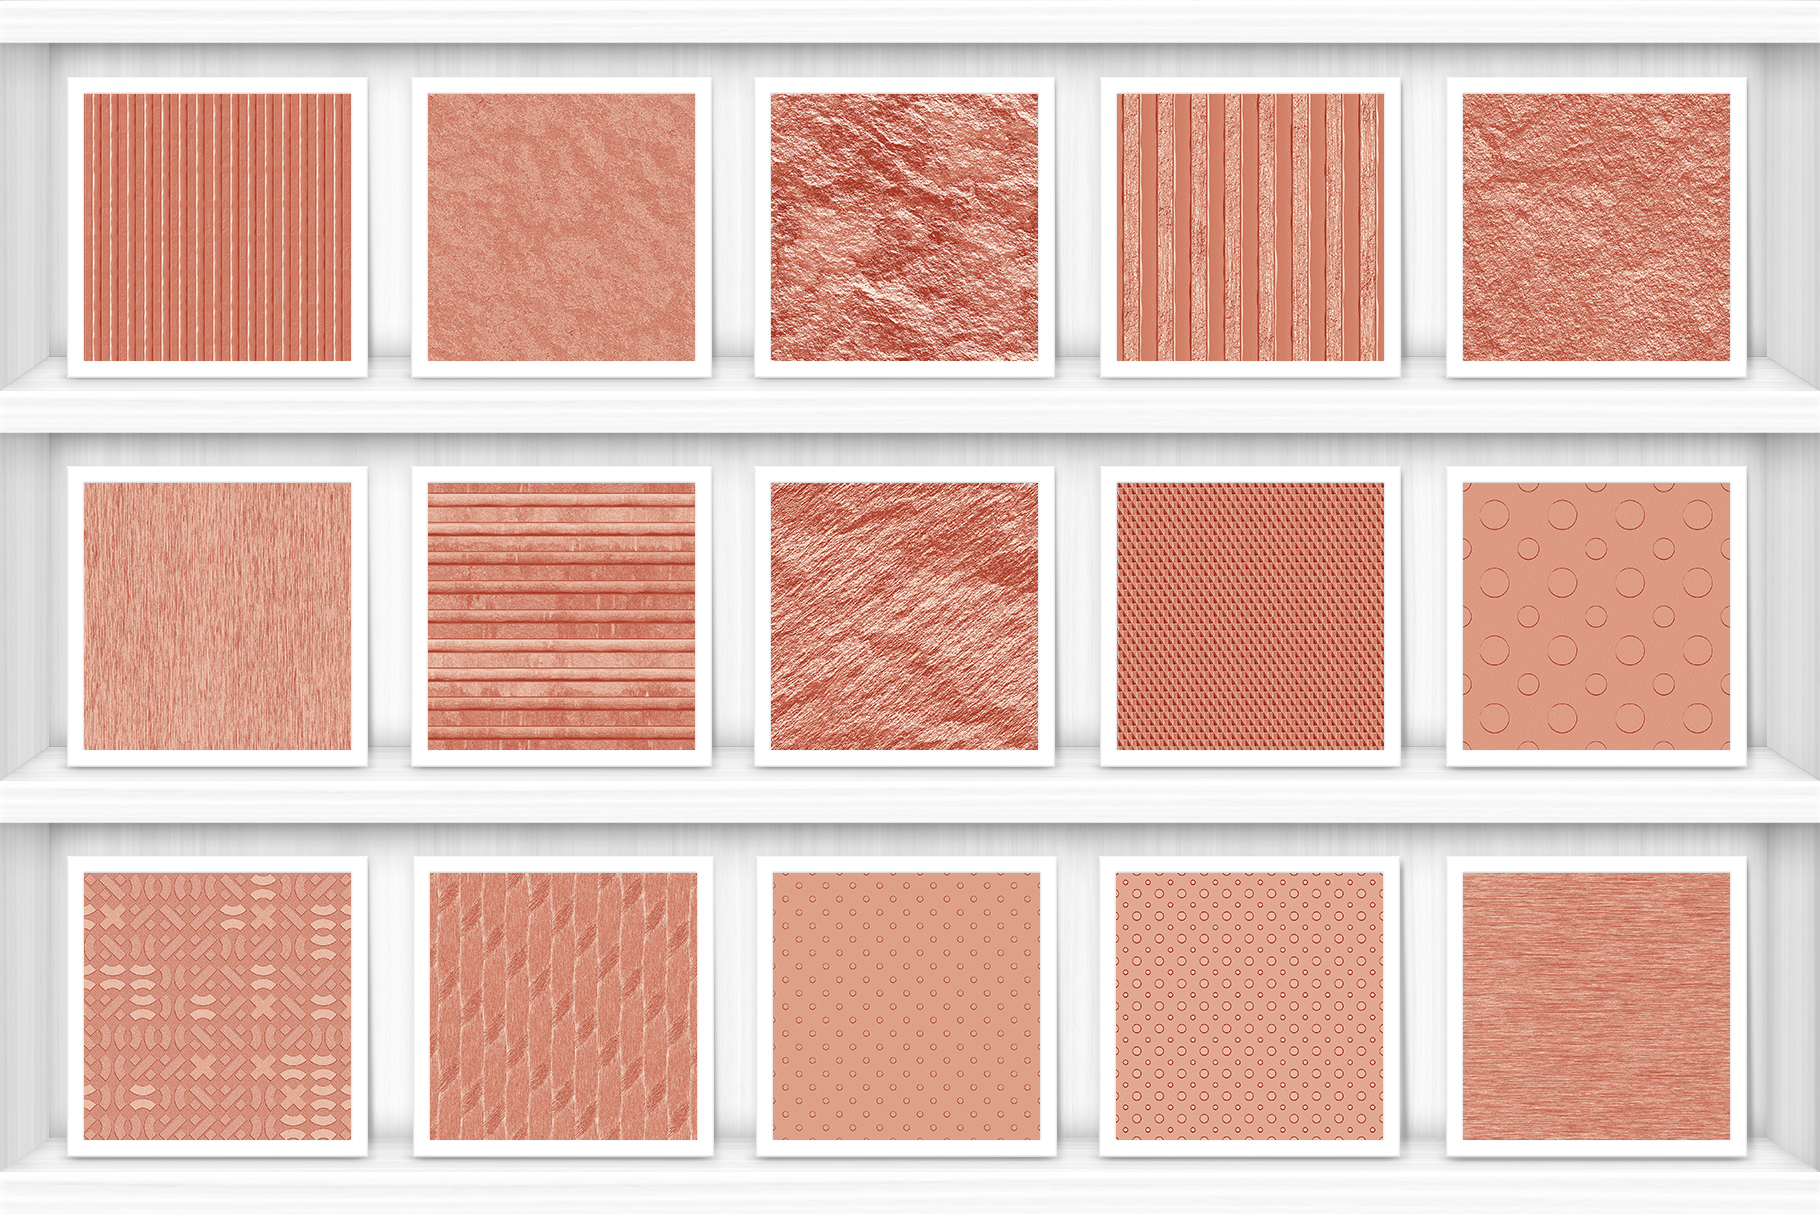 30 Copper Background Textures Samples Shelves Showcase Preview Set 2